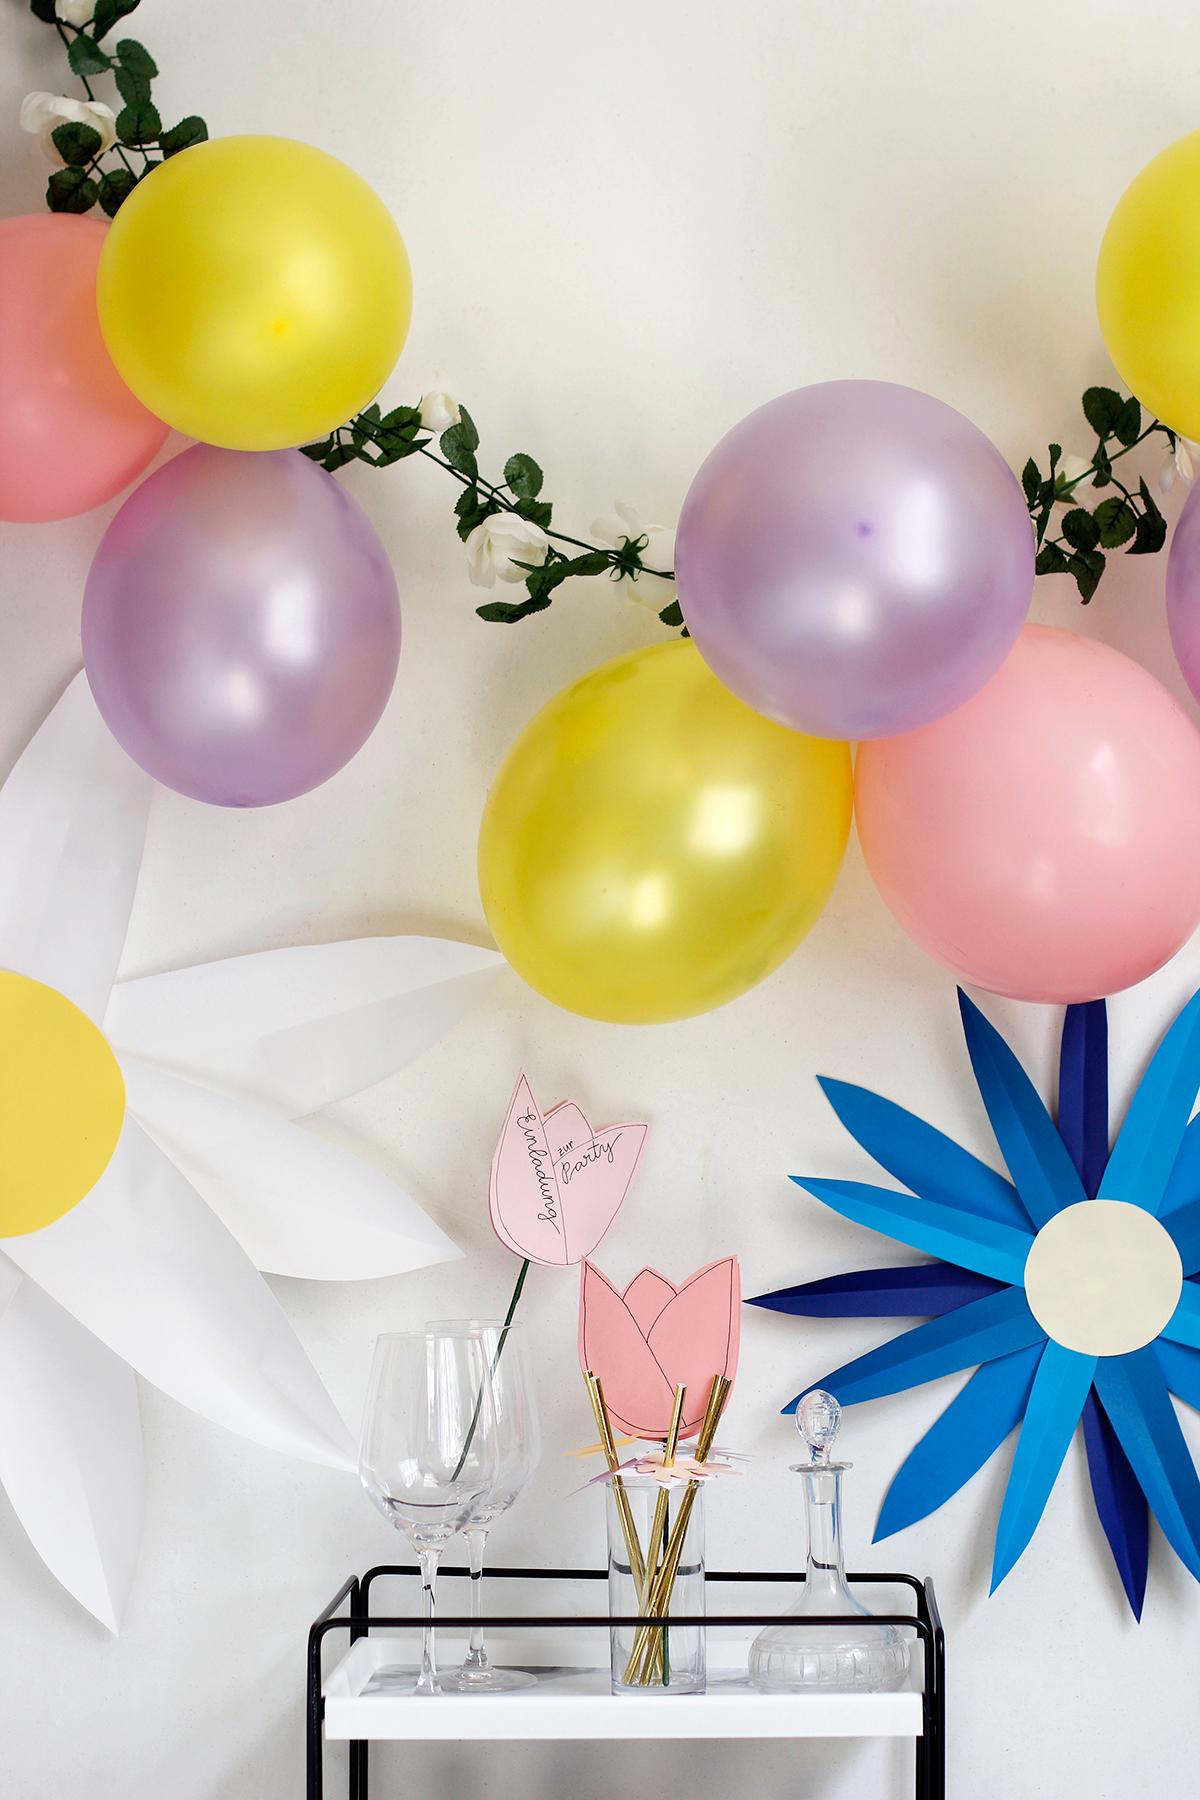 Luftballon-Blumen-Girlande selber machen |we love handmade